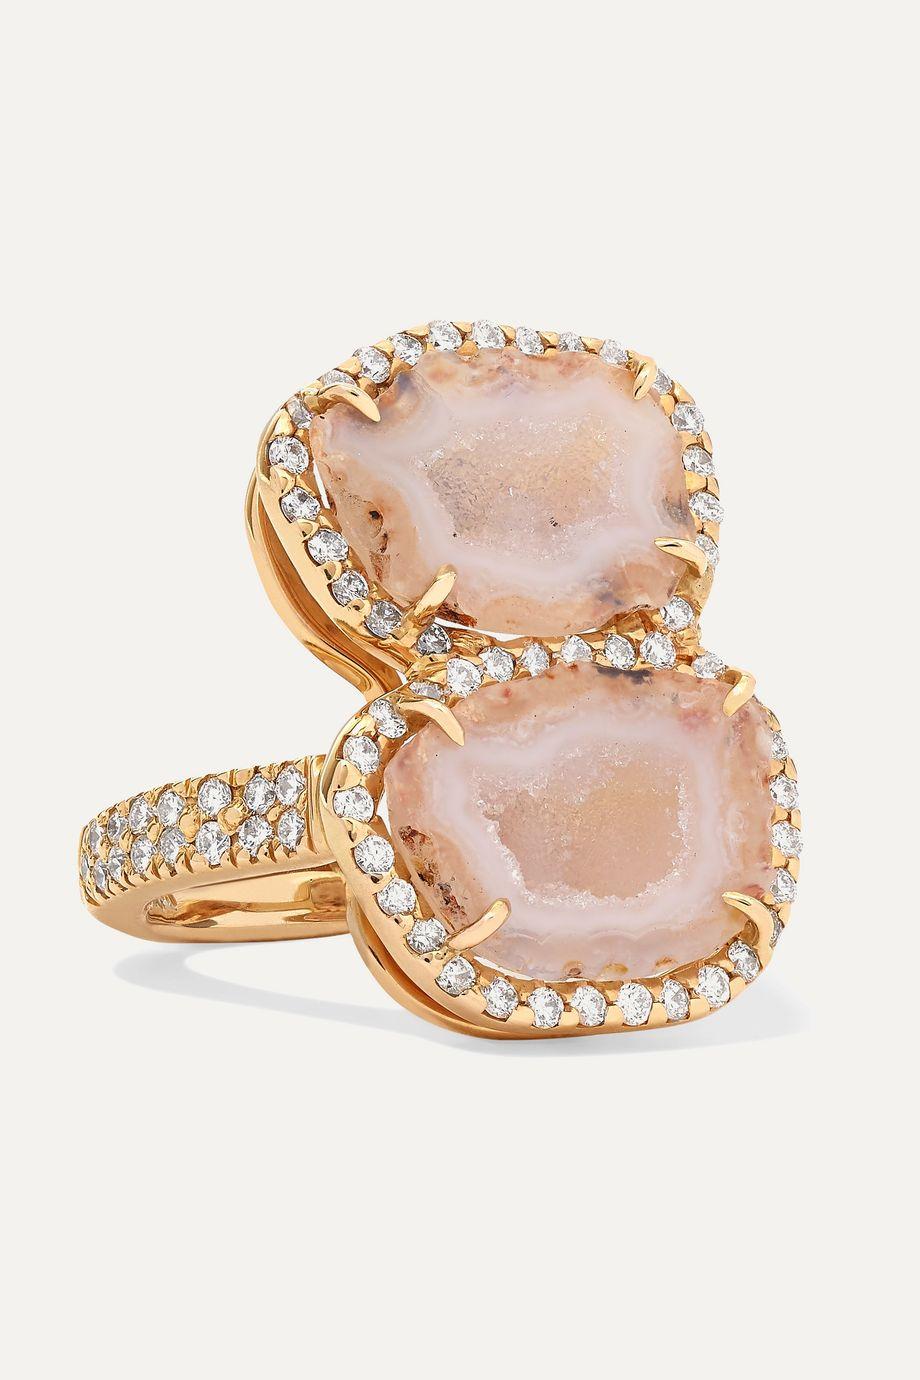 Kimberly McDonald + NET SUSTAIN 18-karat rose gold geode and diamond ring